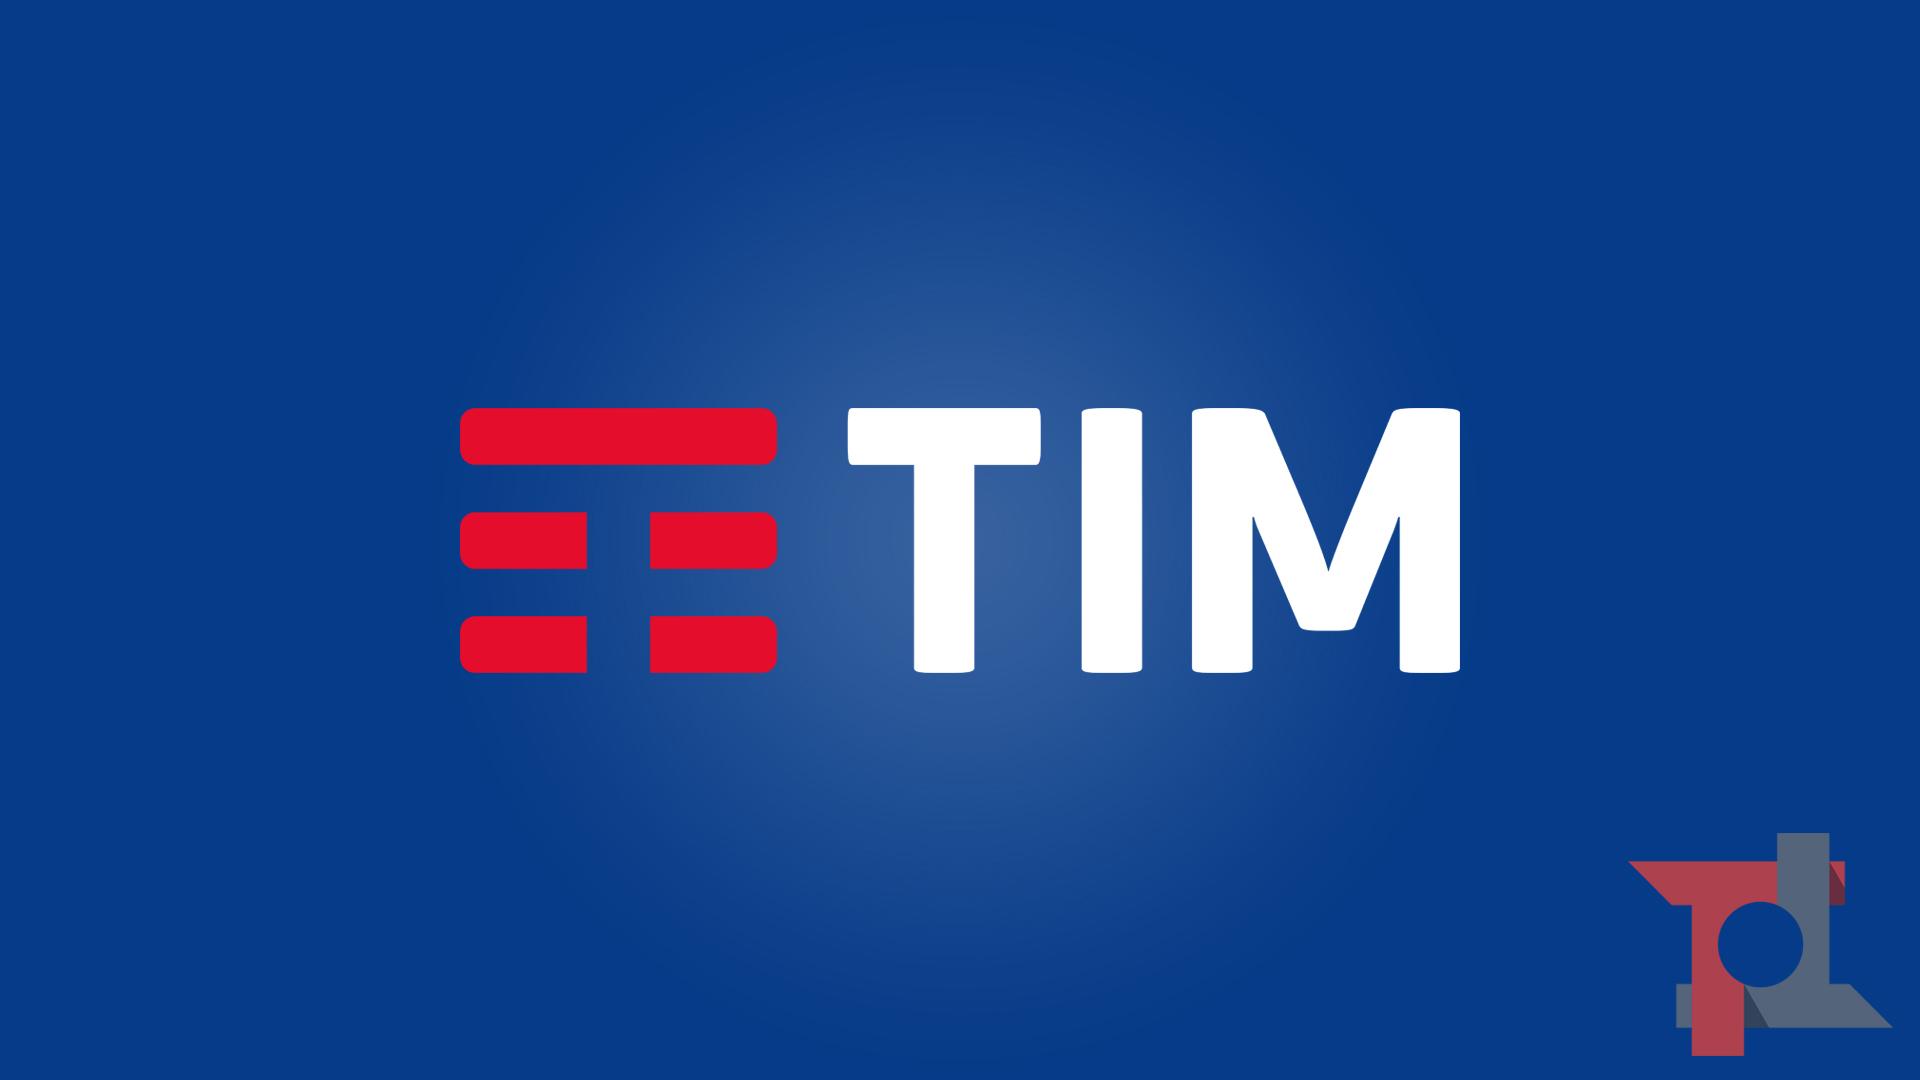 Migliori offerte fibra e ADSL di TIM, Vodafone, Fastweb, WINDTRE e Tiscali 1